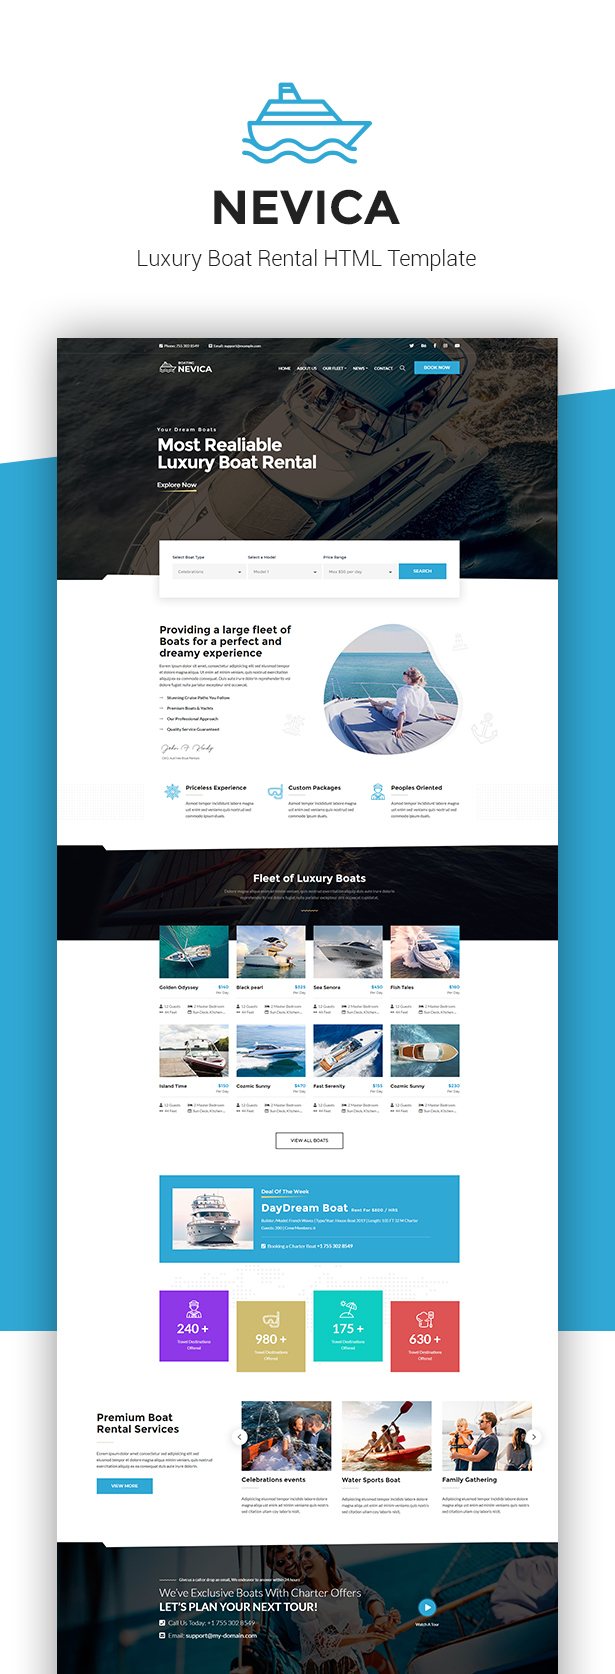 Nevica - Luxury Boats Rental HTML - 1